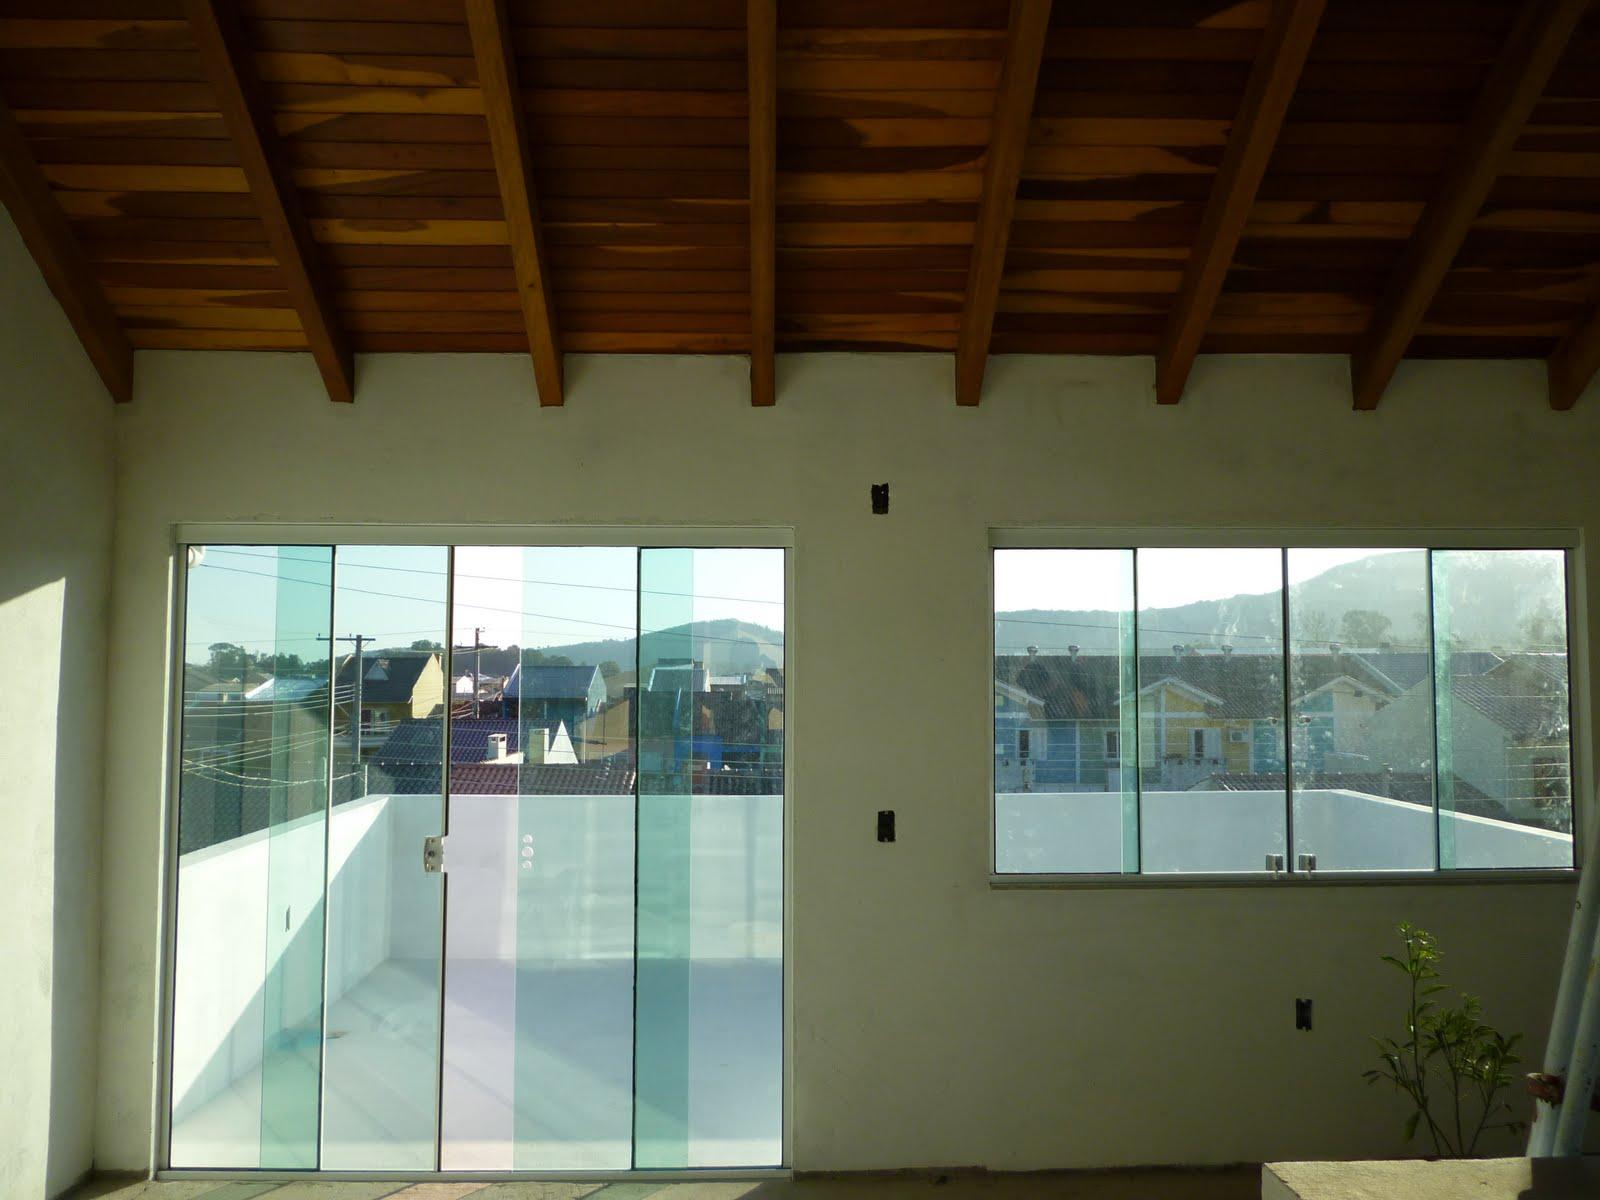 #5A3E10 Obras RB Vidros 1756 Janela De Aluminio Ou Vidro Temperado